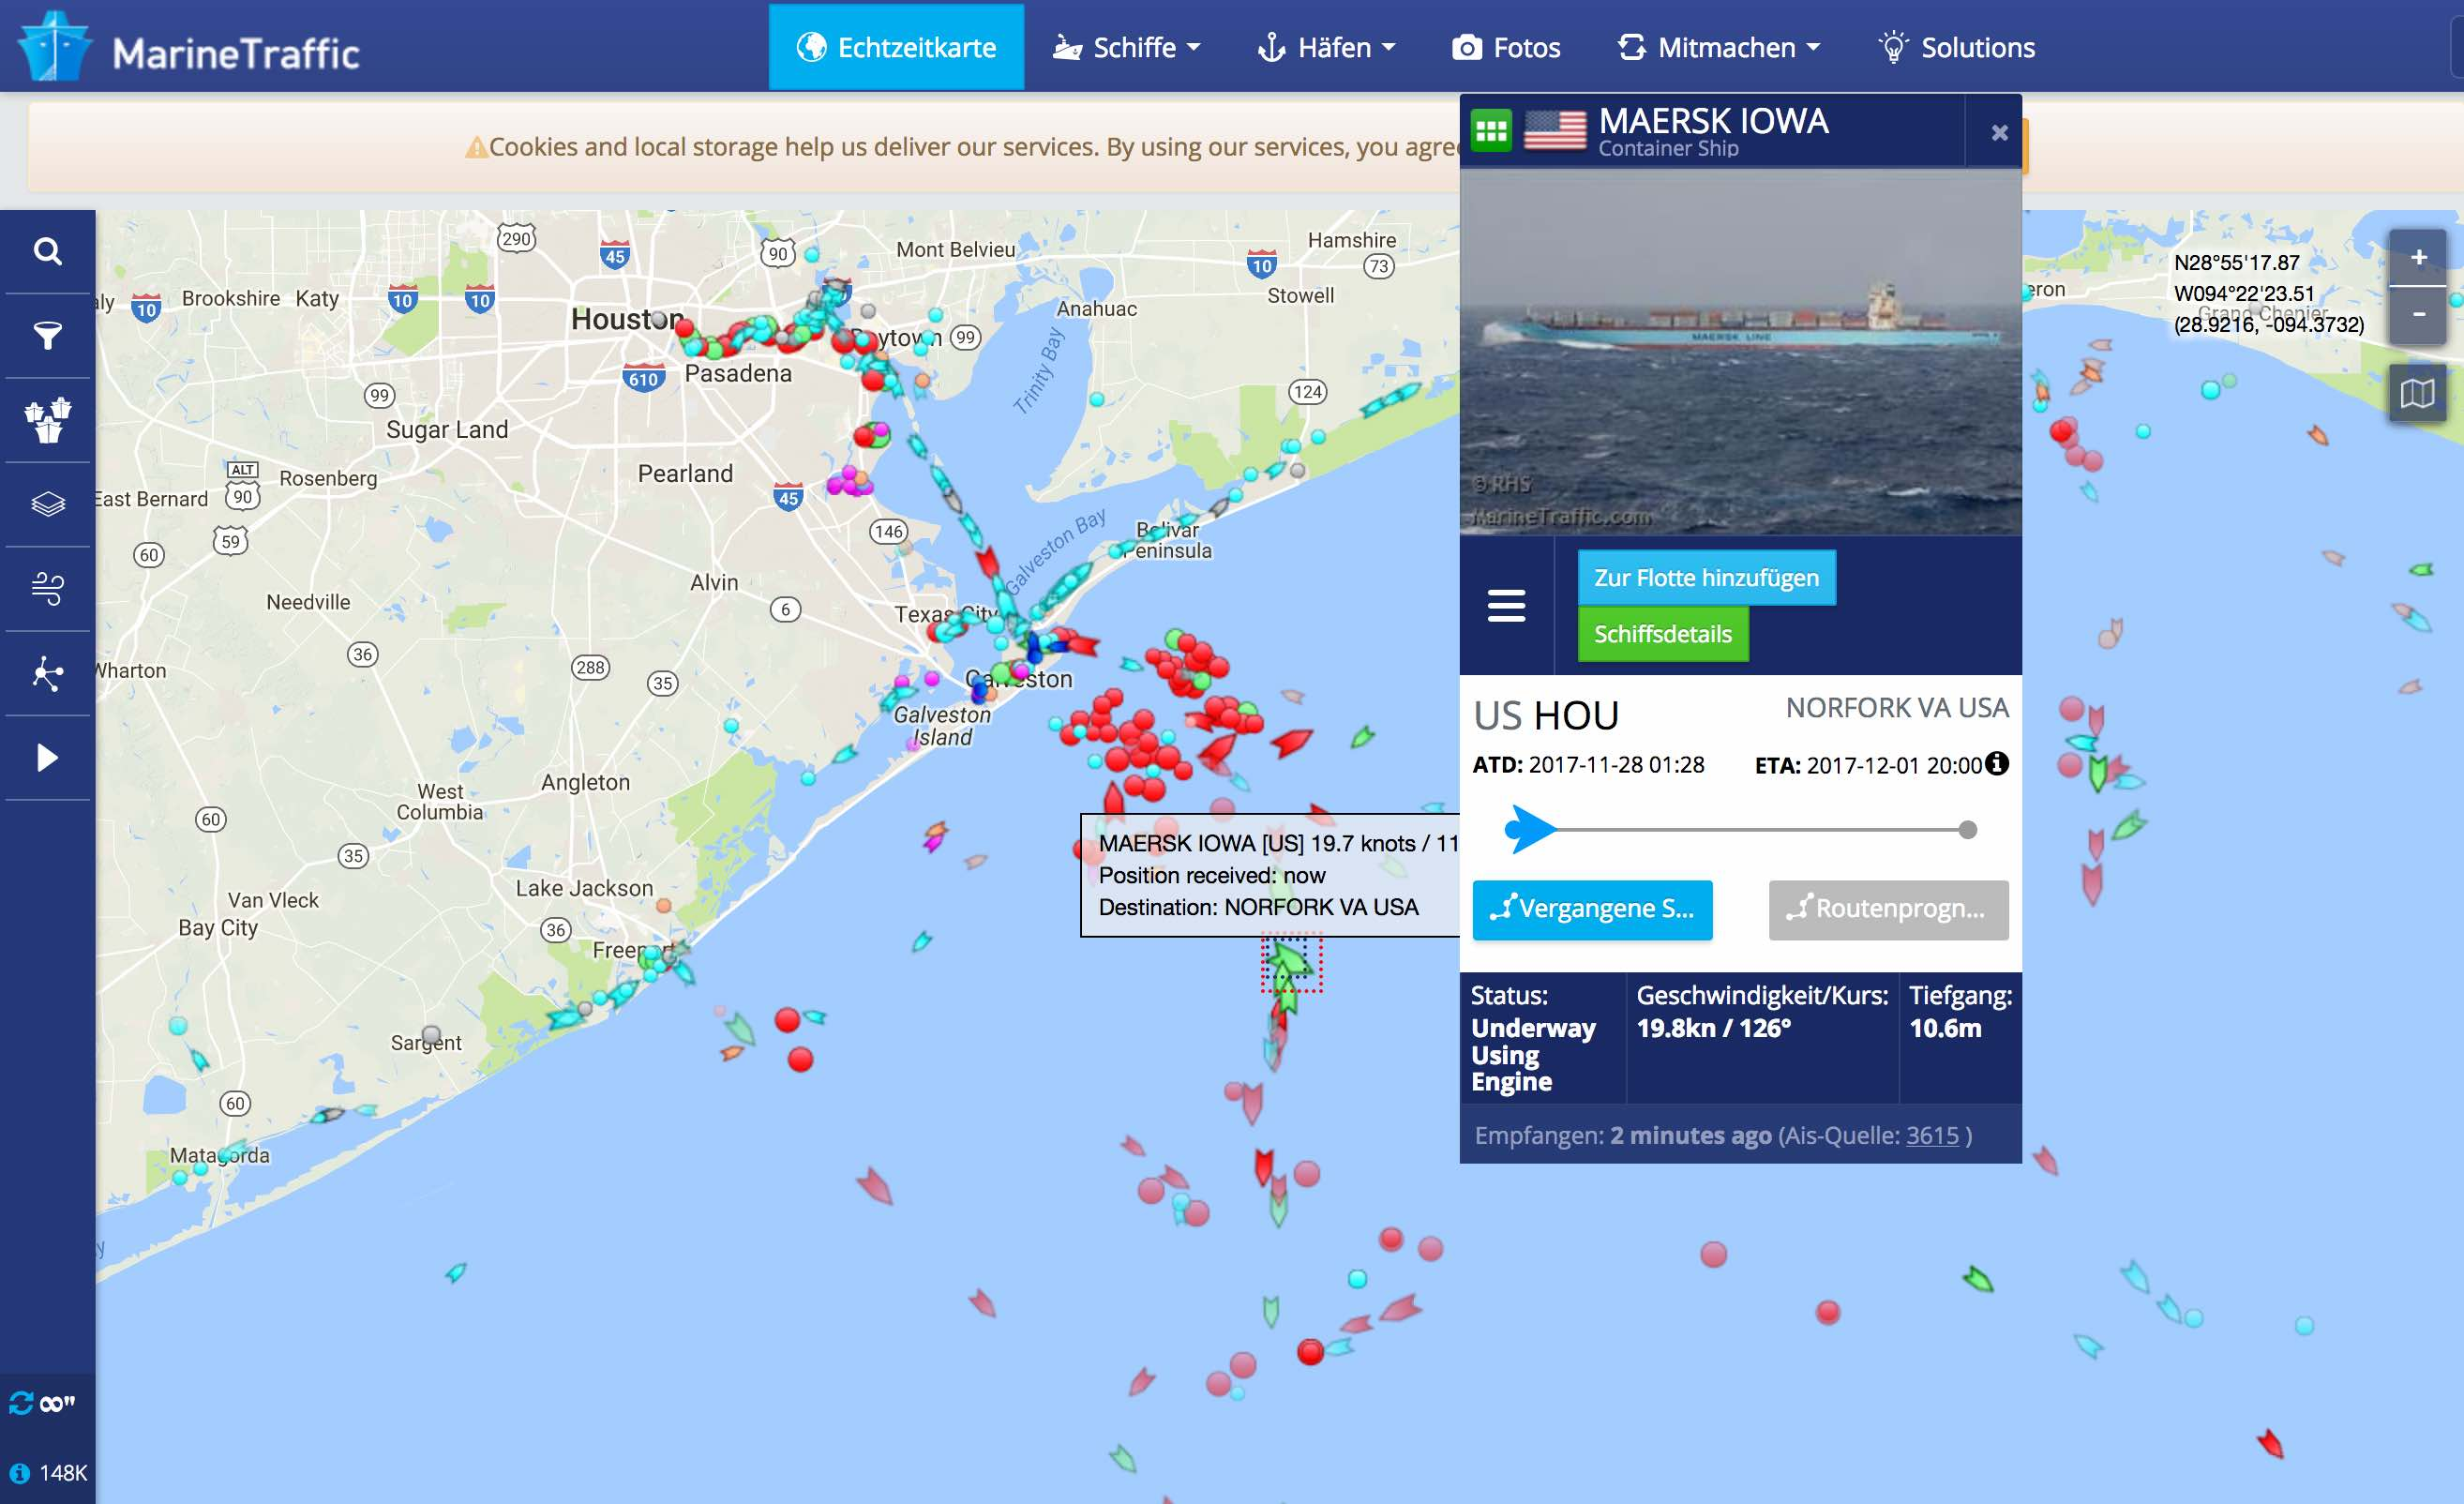 MarineTraffic_Maersk_Iowa